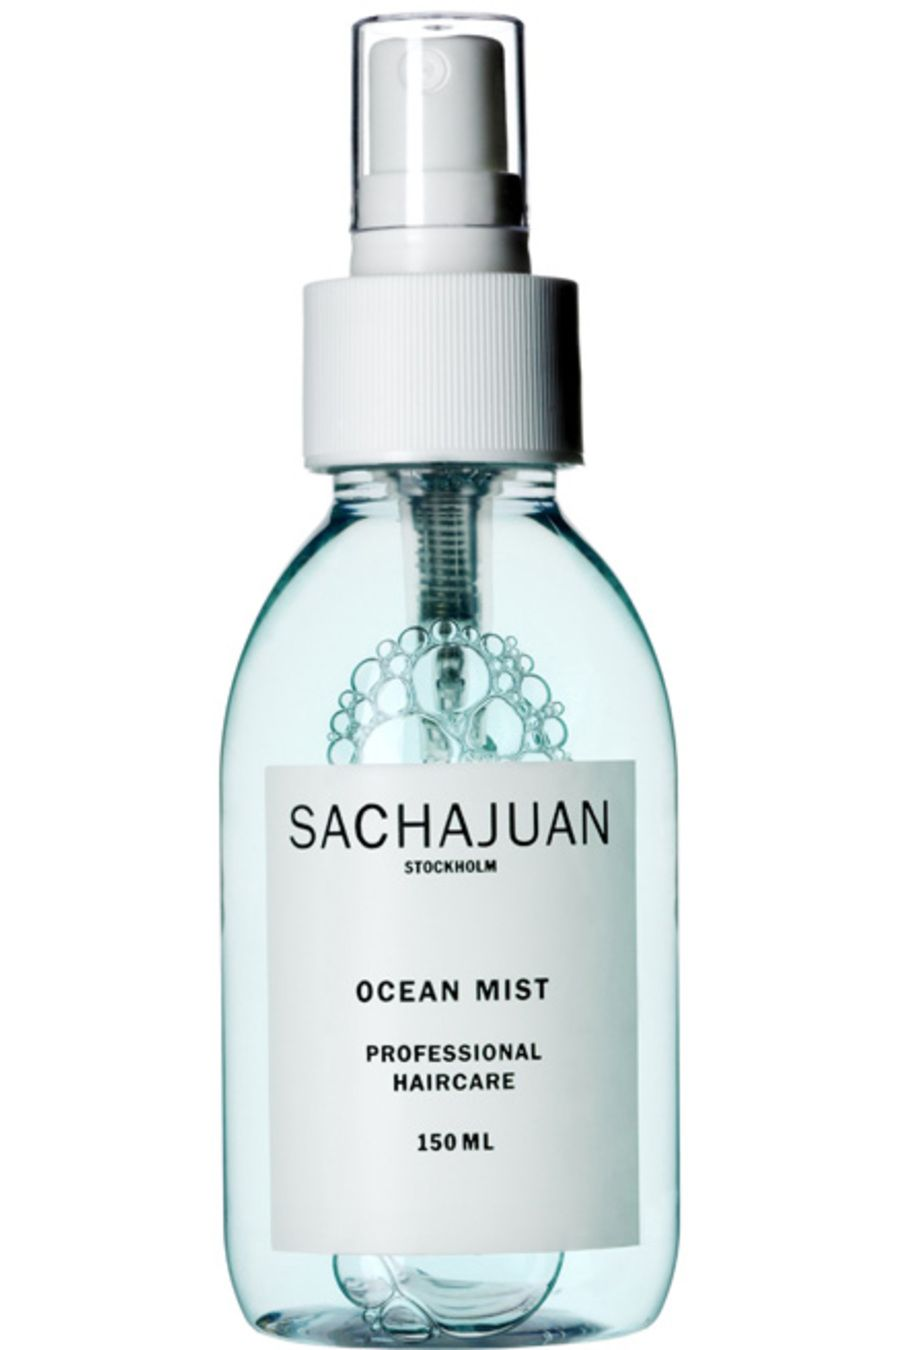 sachajuan ocean mist tutorial